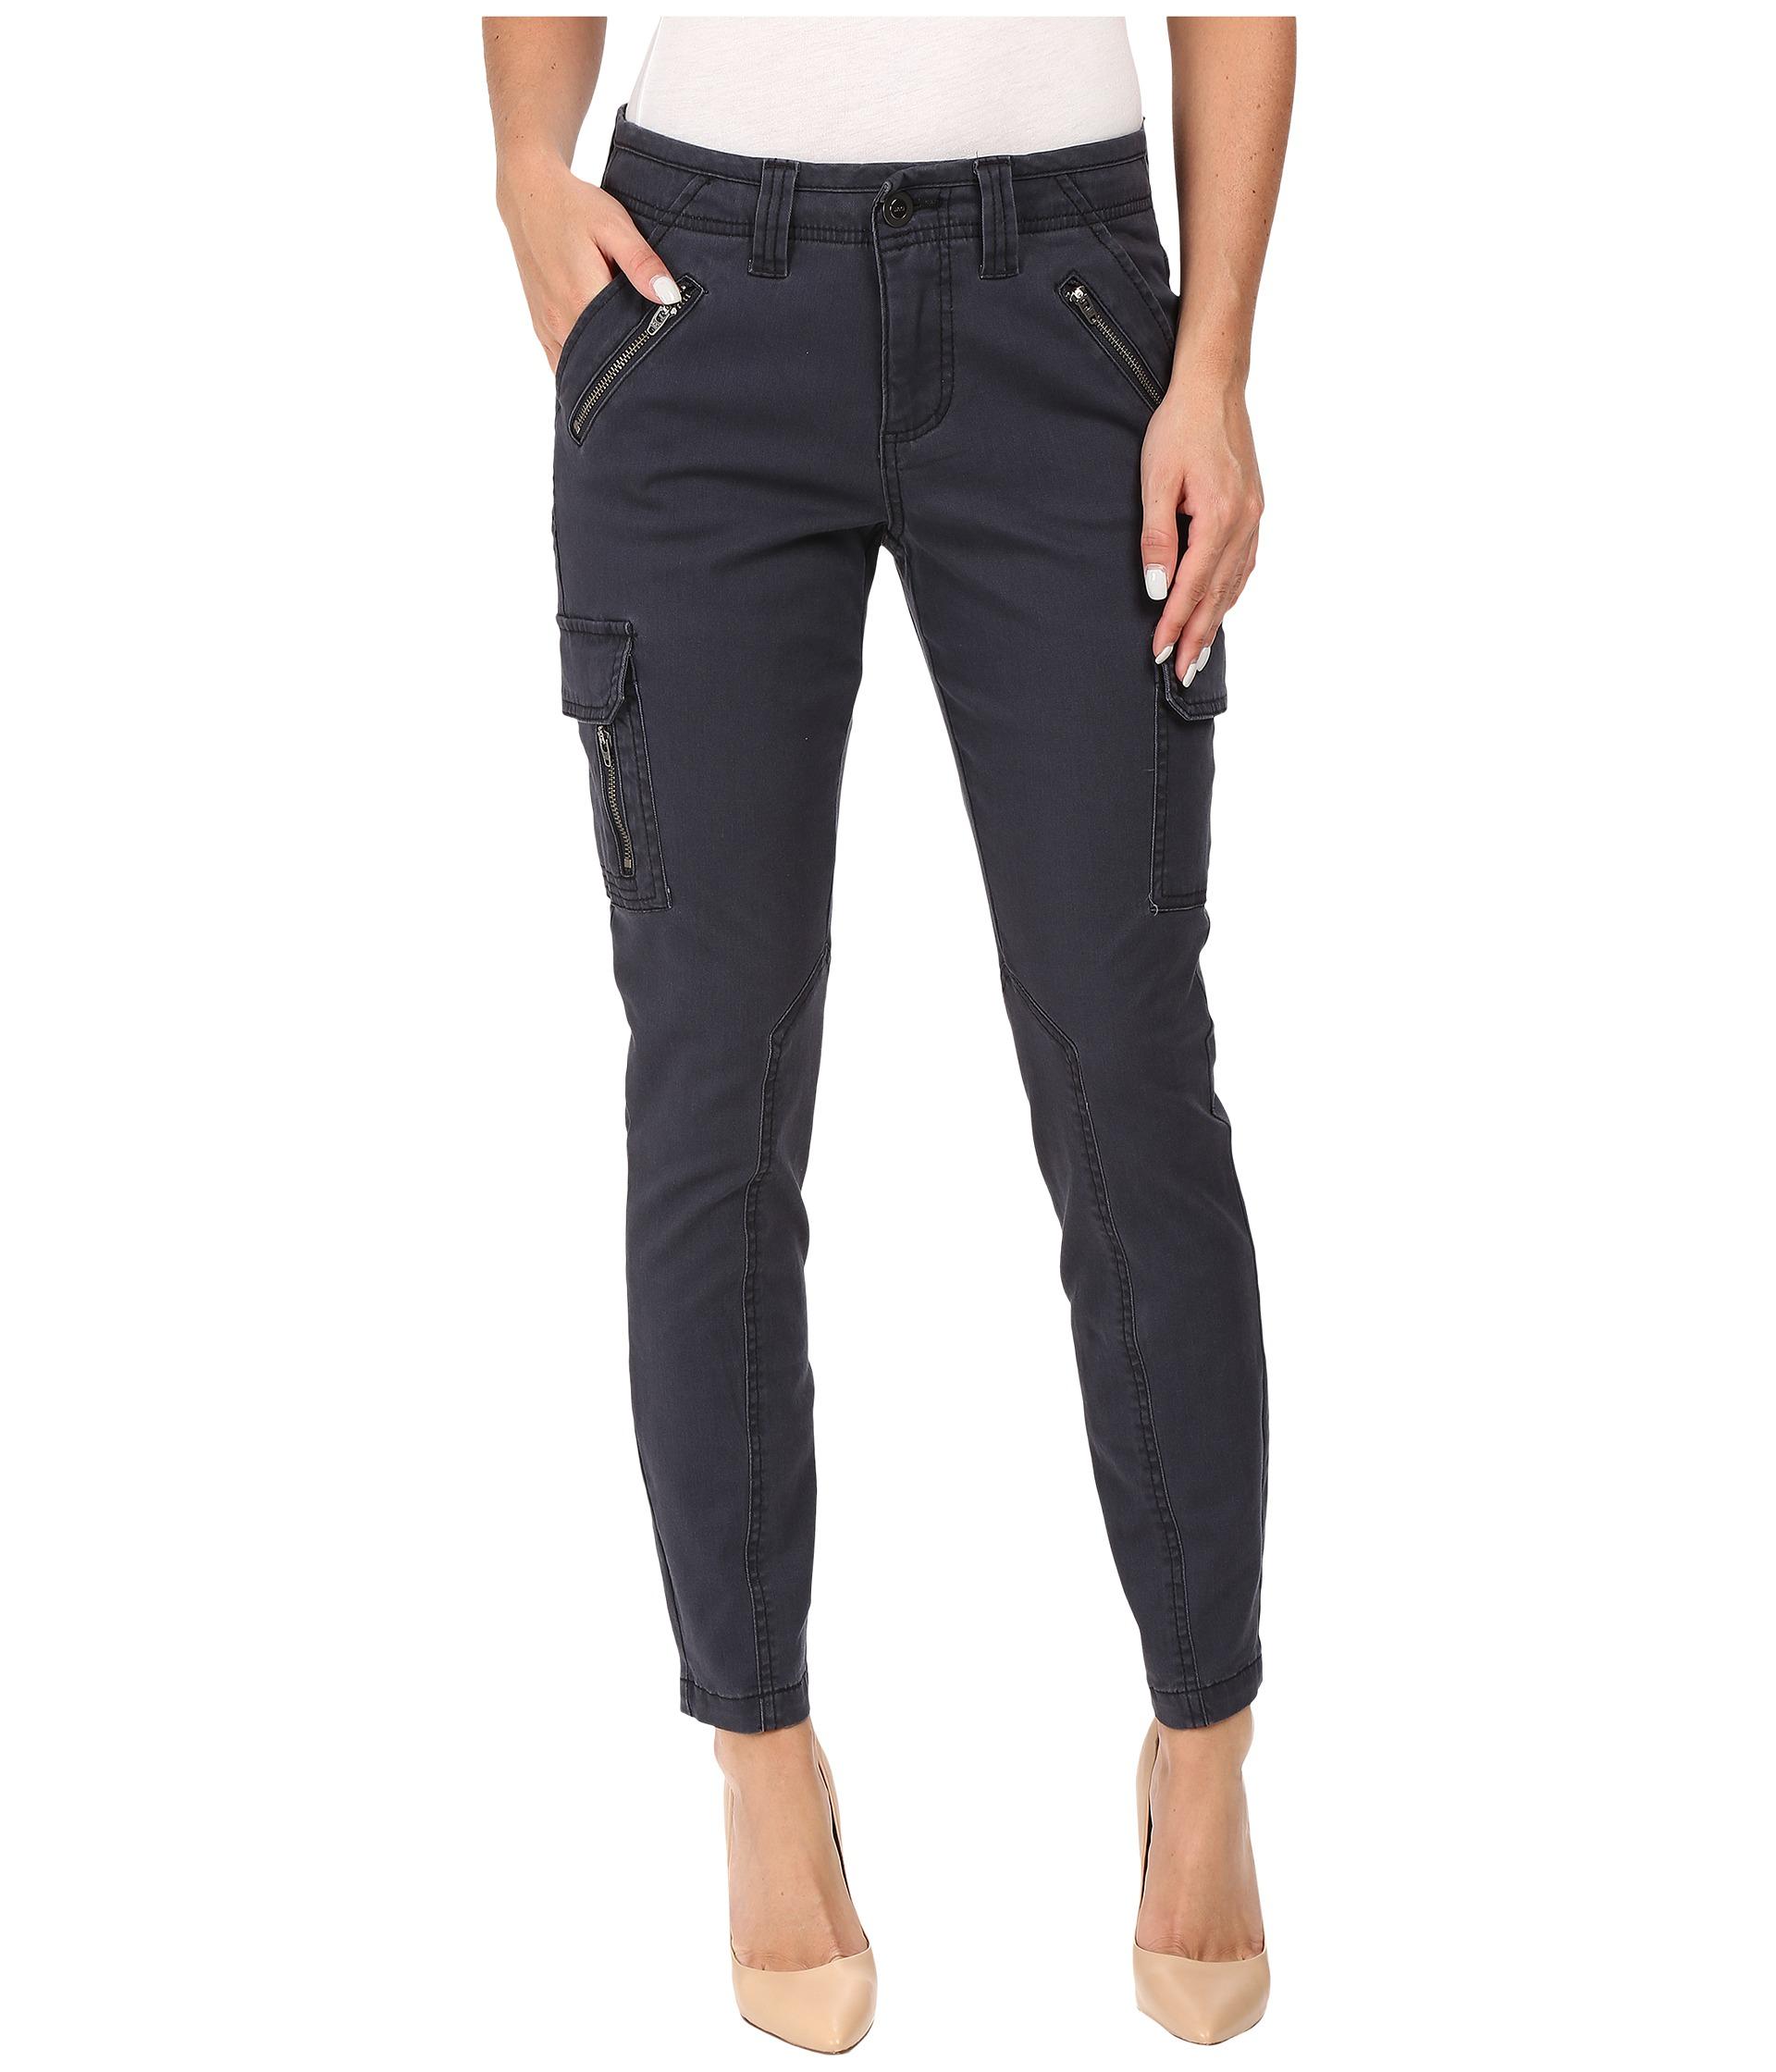 women cargo pants, Clothing, Women at 6pm.com